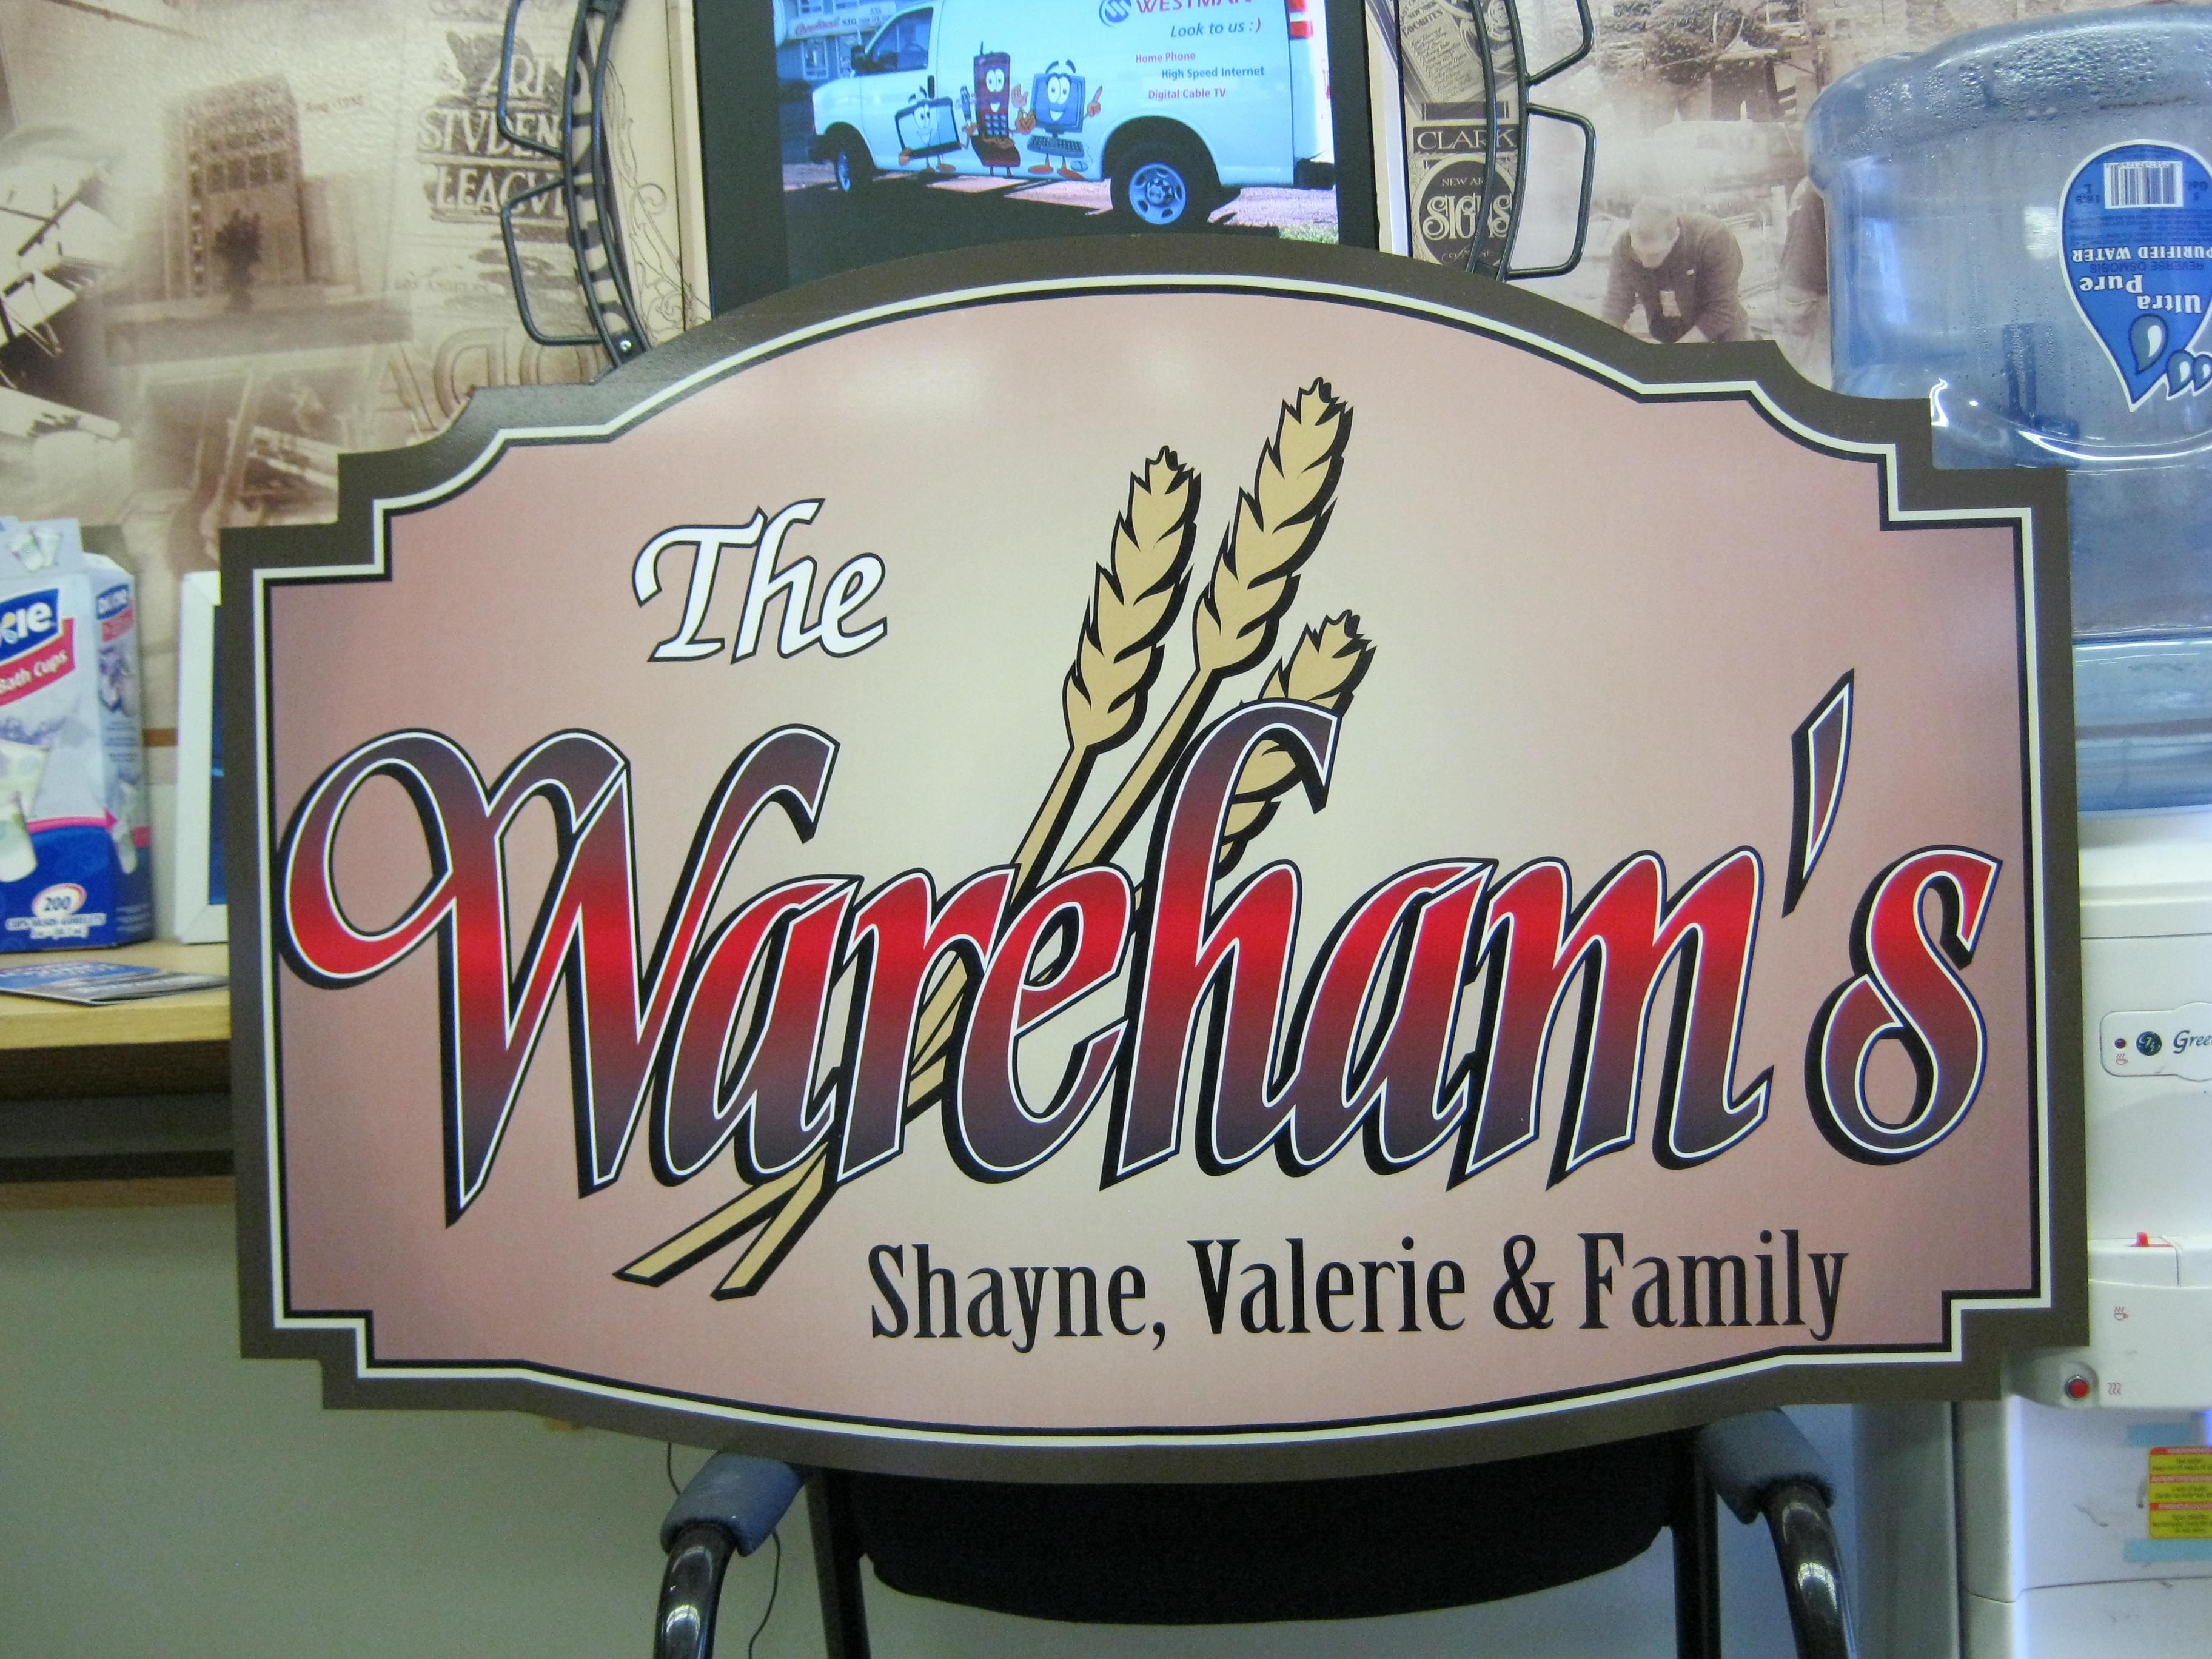 warehams